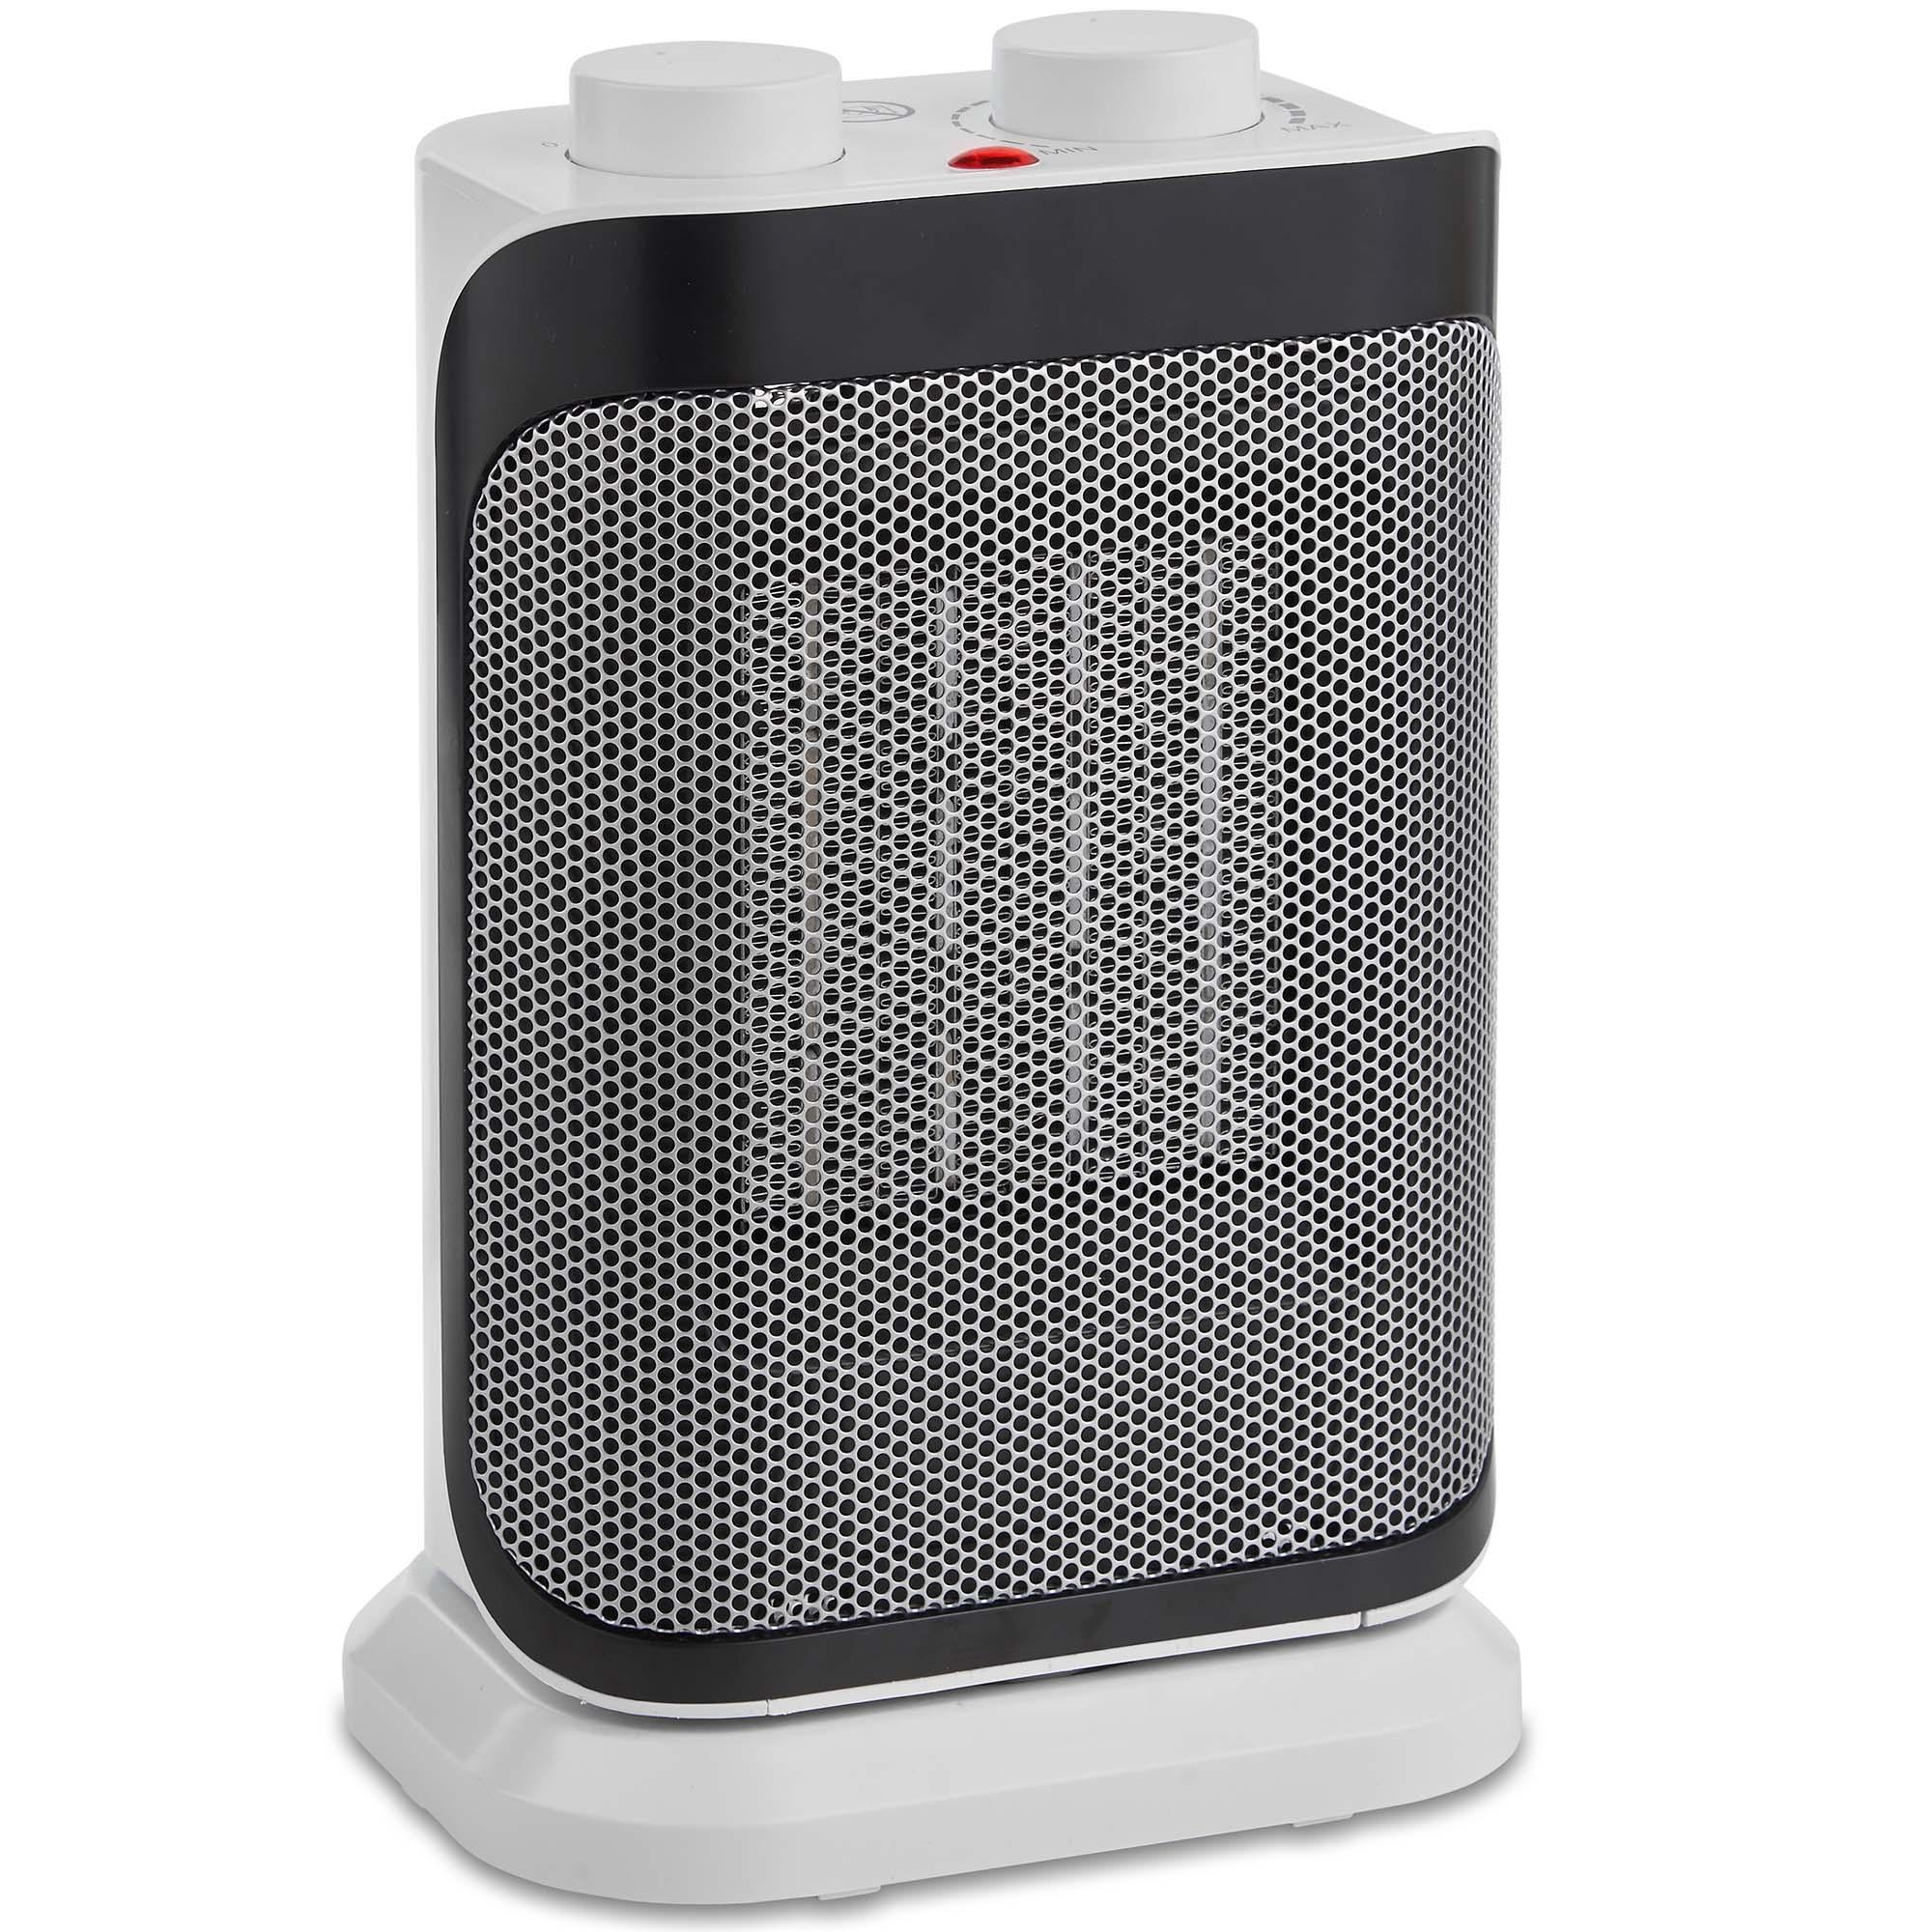 Vonhaus 1500w Fan Heater Oscillating Electric Ceramic Ptc